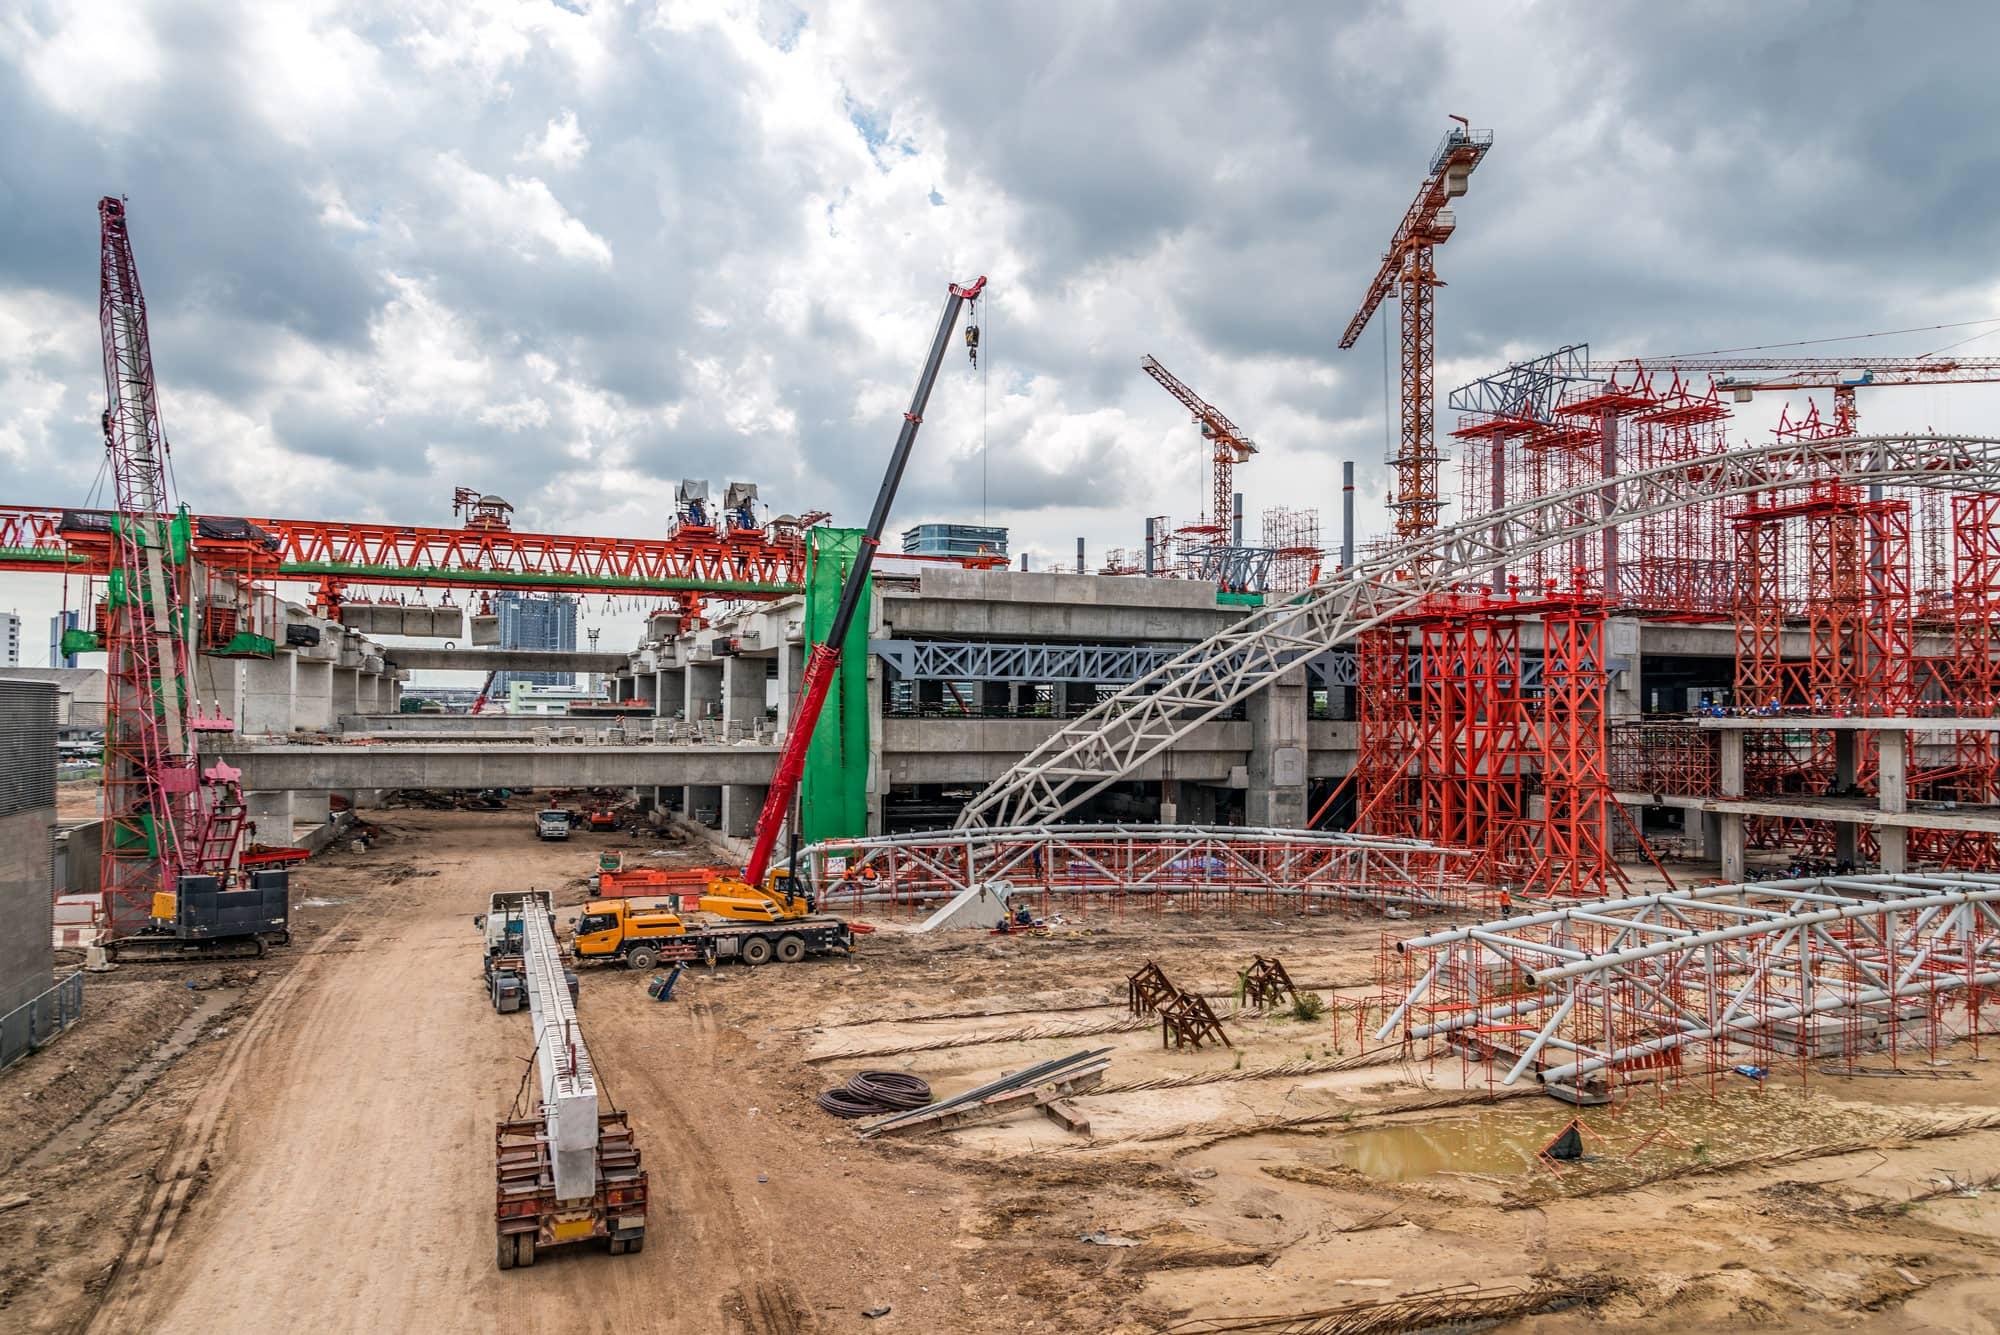 Construction jobsite with alot of cranes